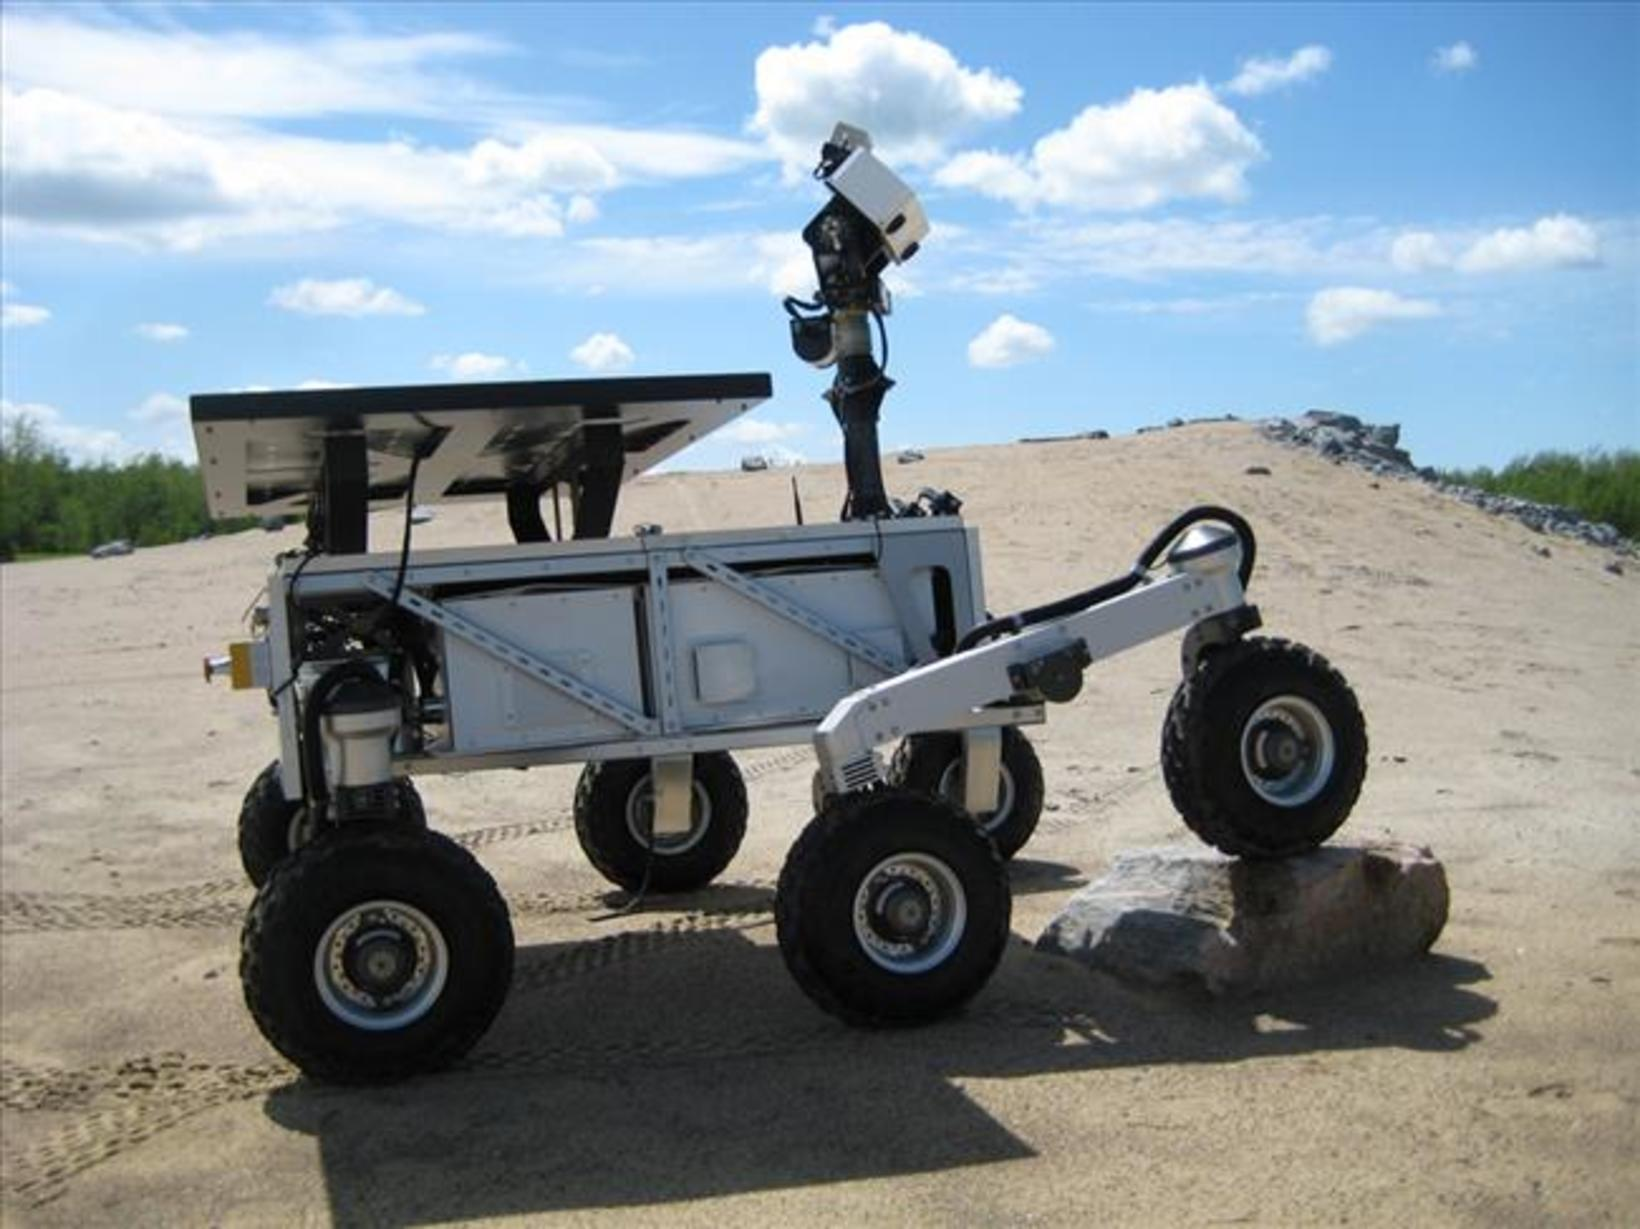 The Mars Exploration Science Rover (MESR).